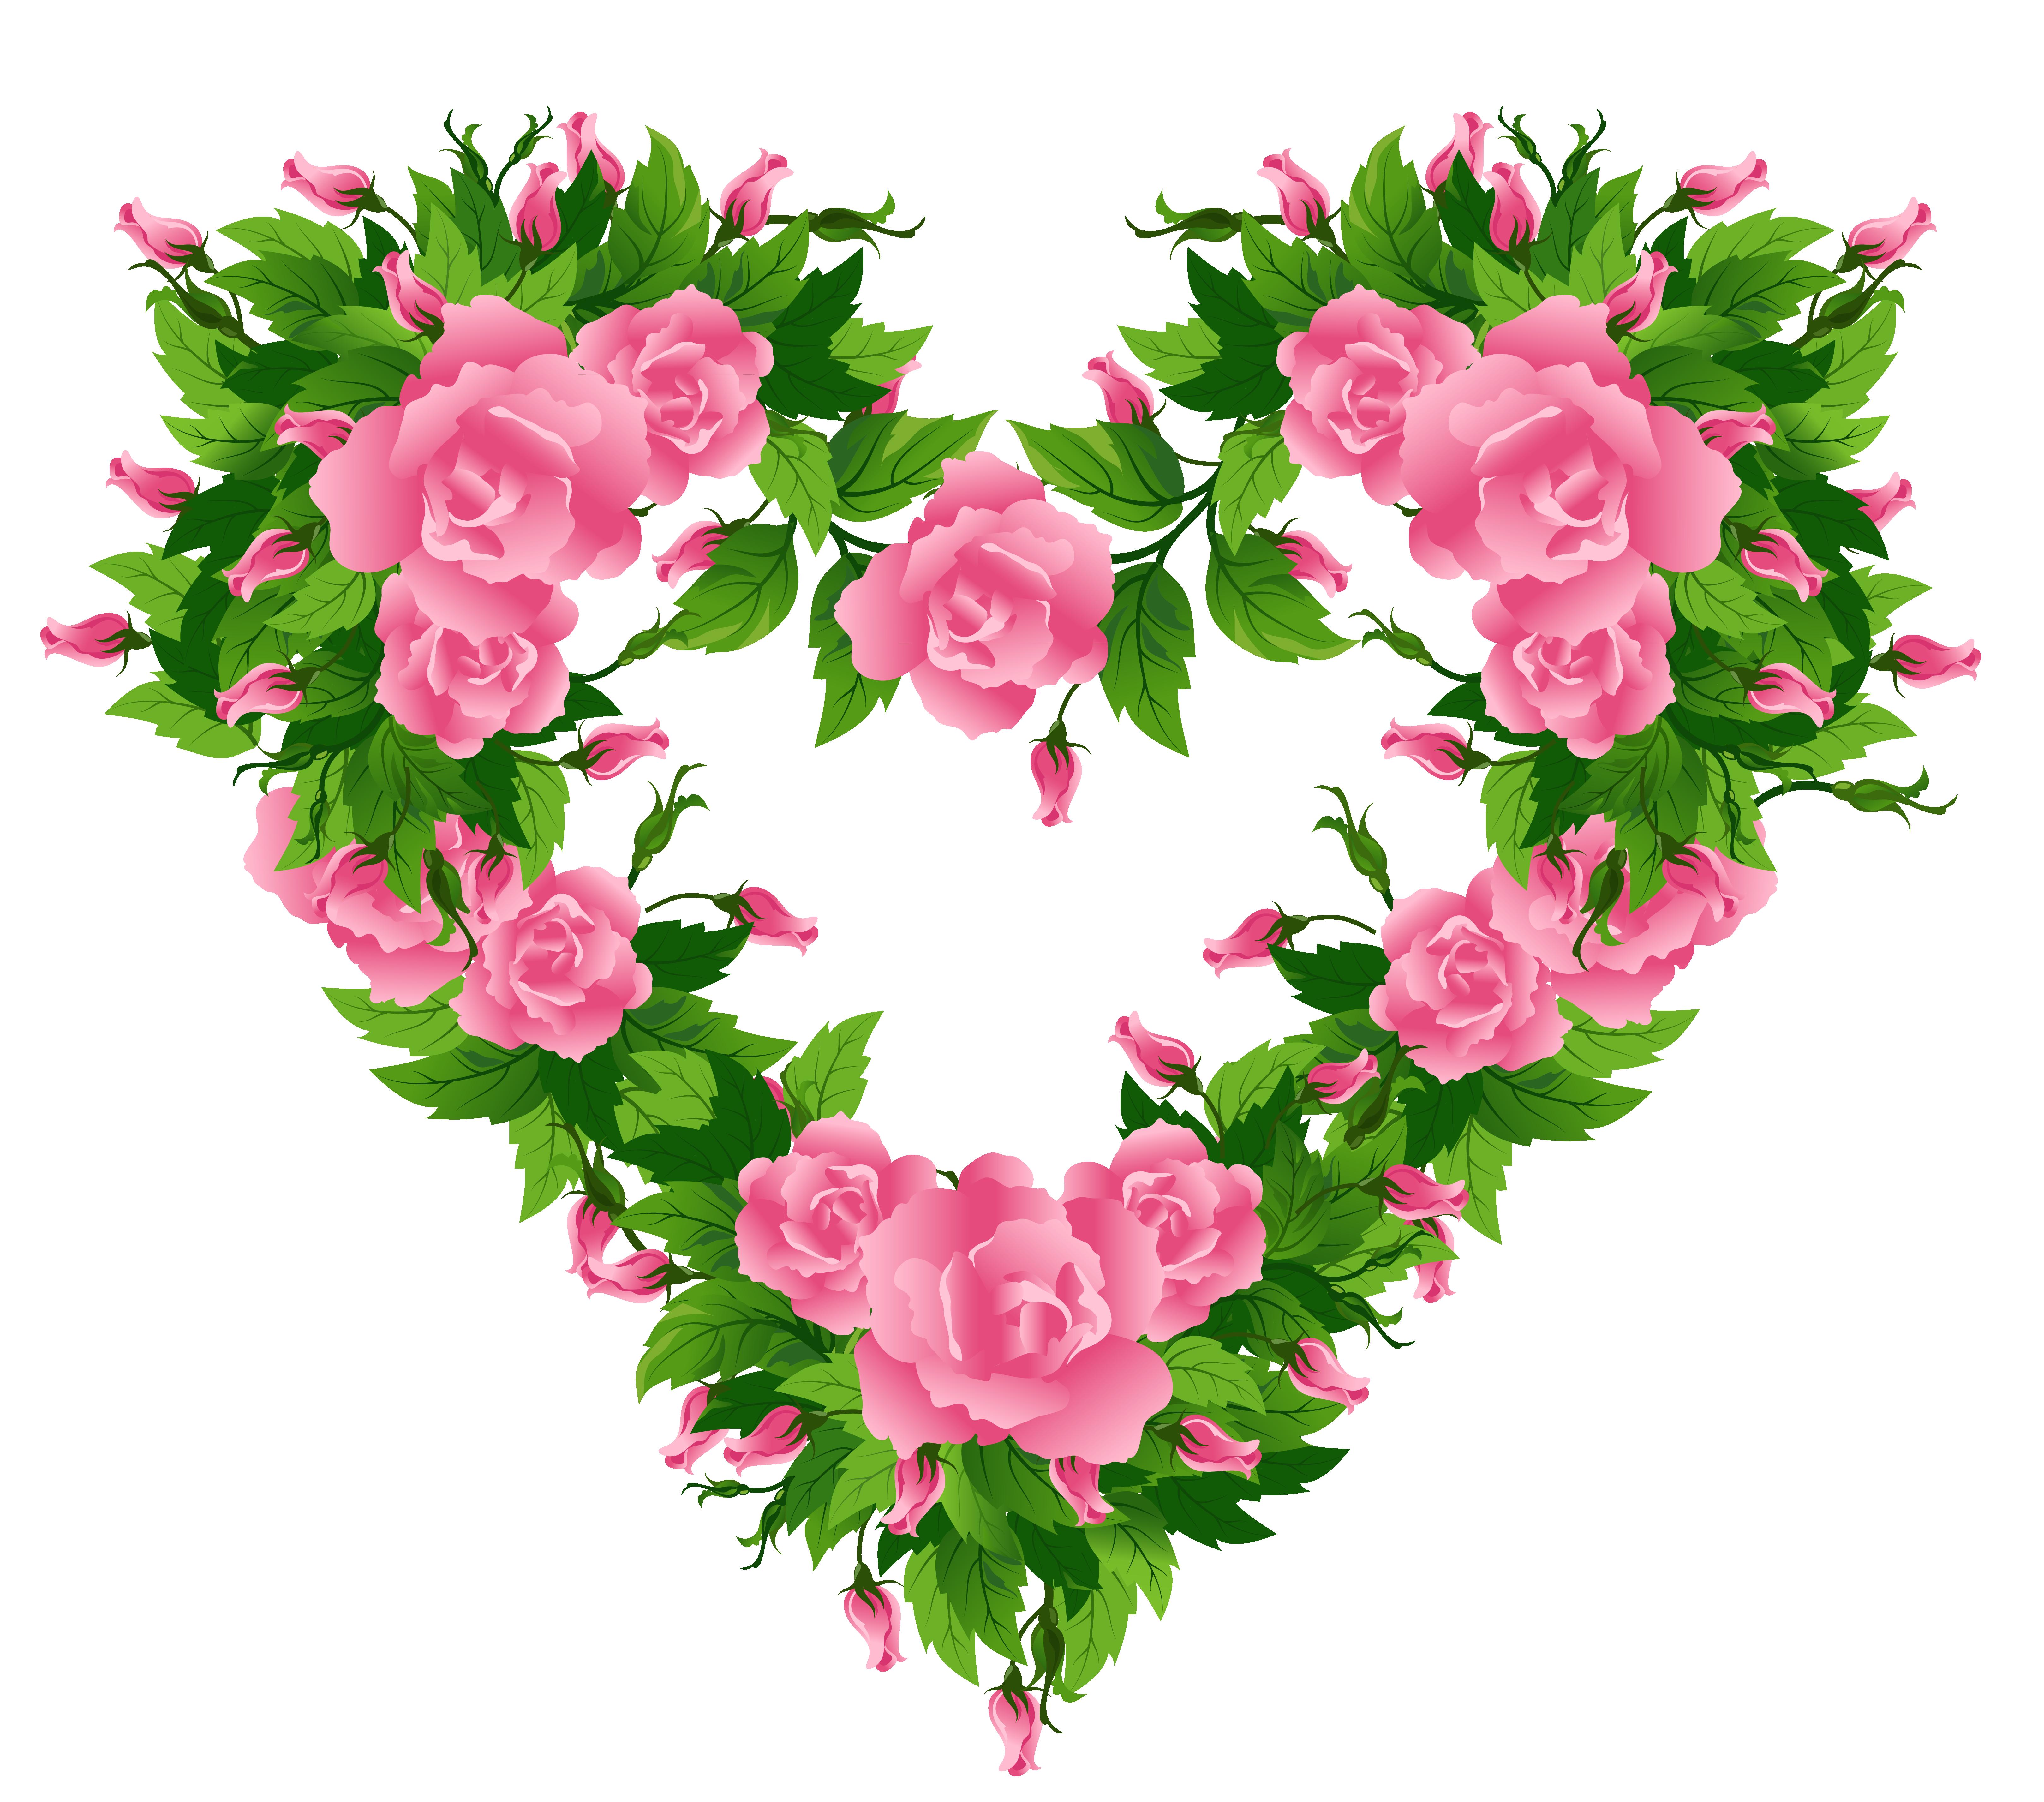 Hearts clipart garden. Pink roses heart decor